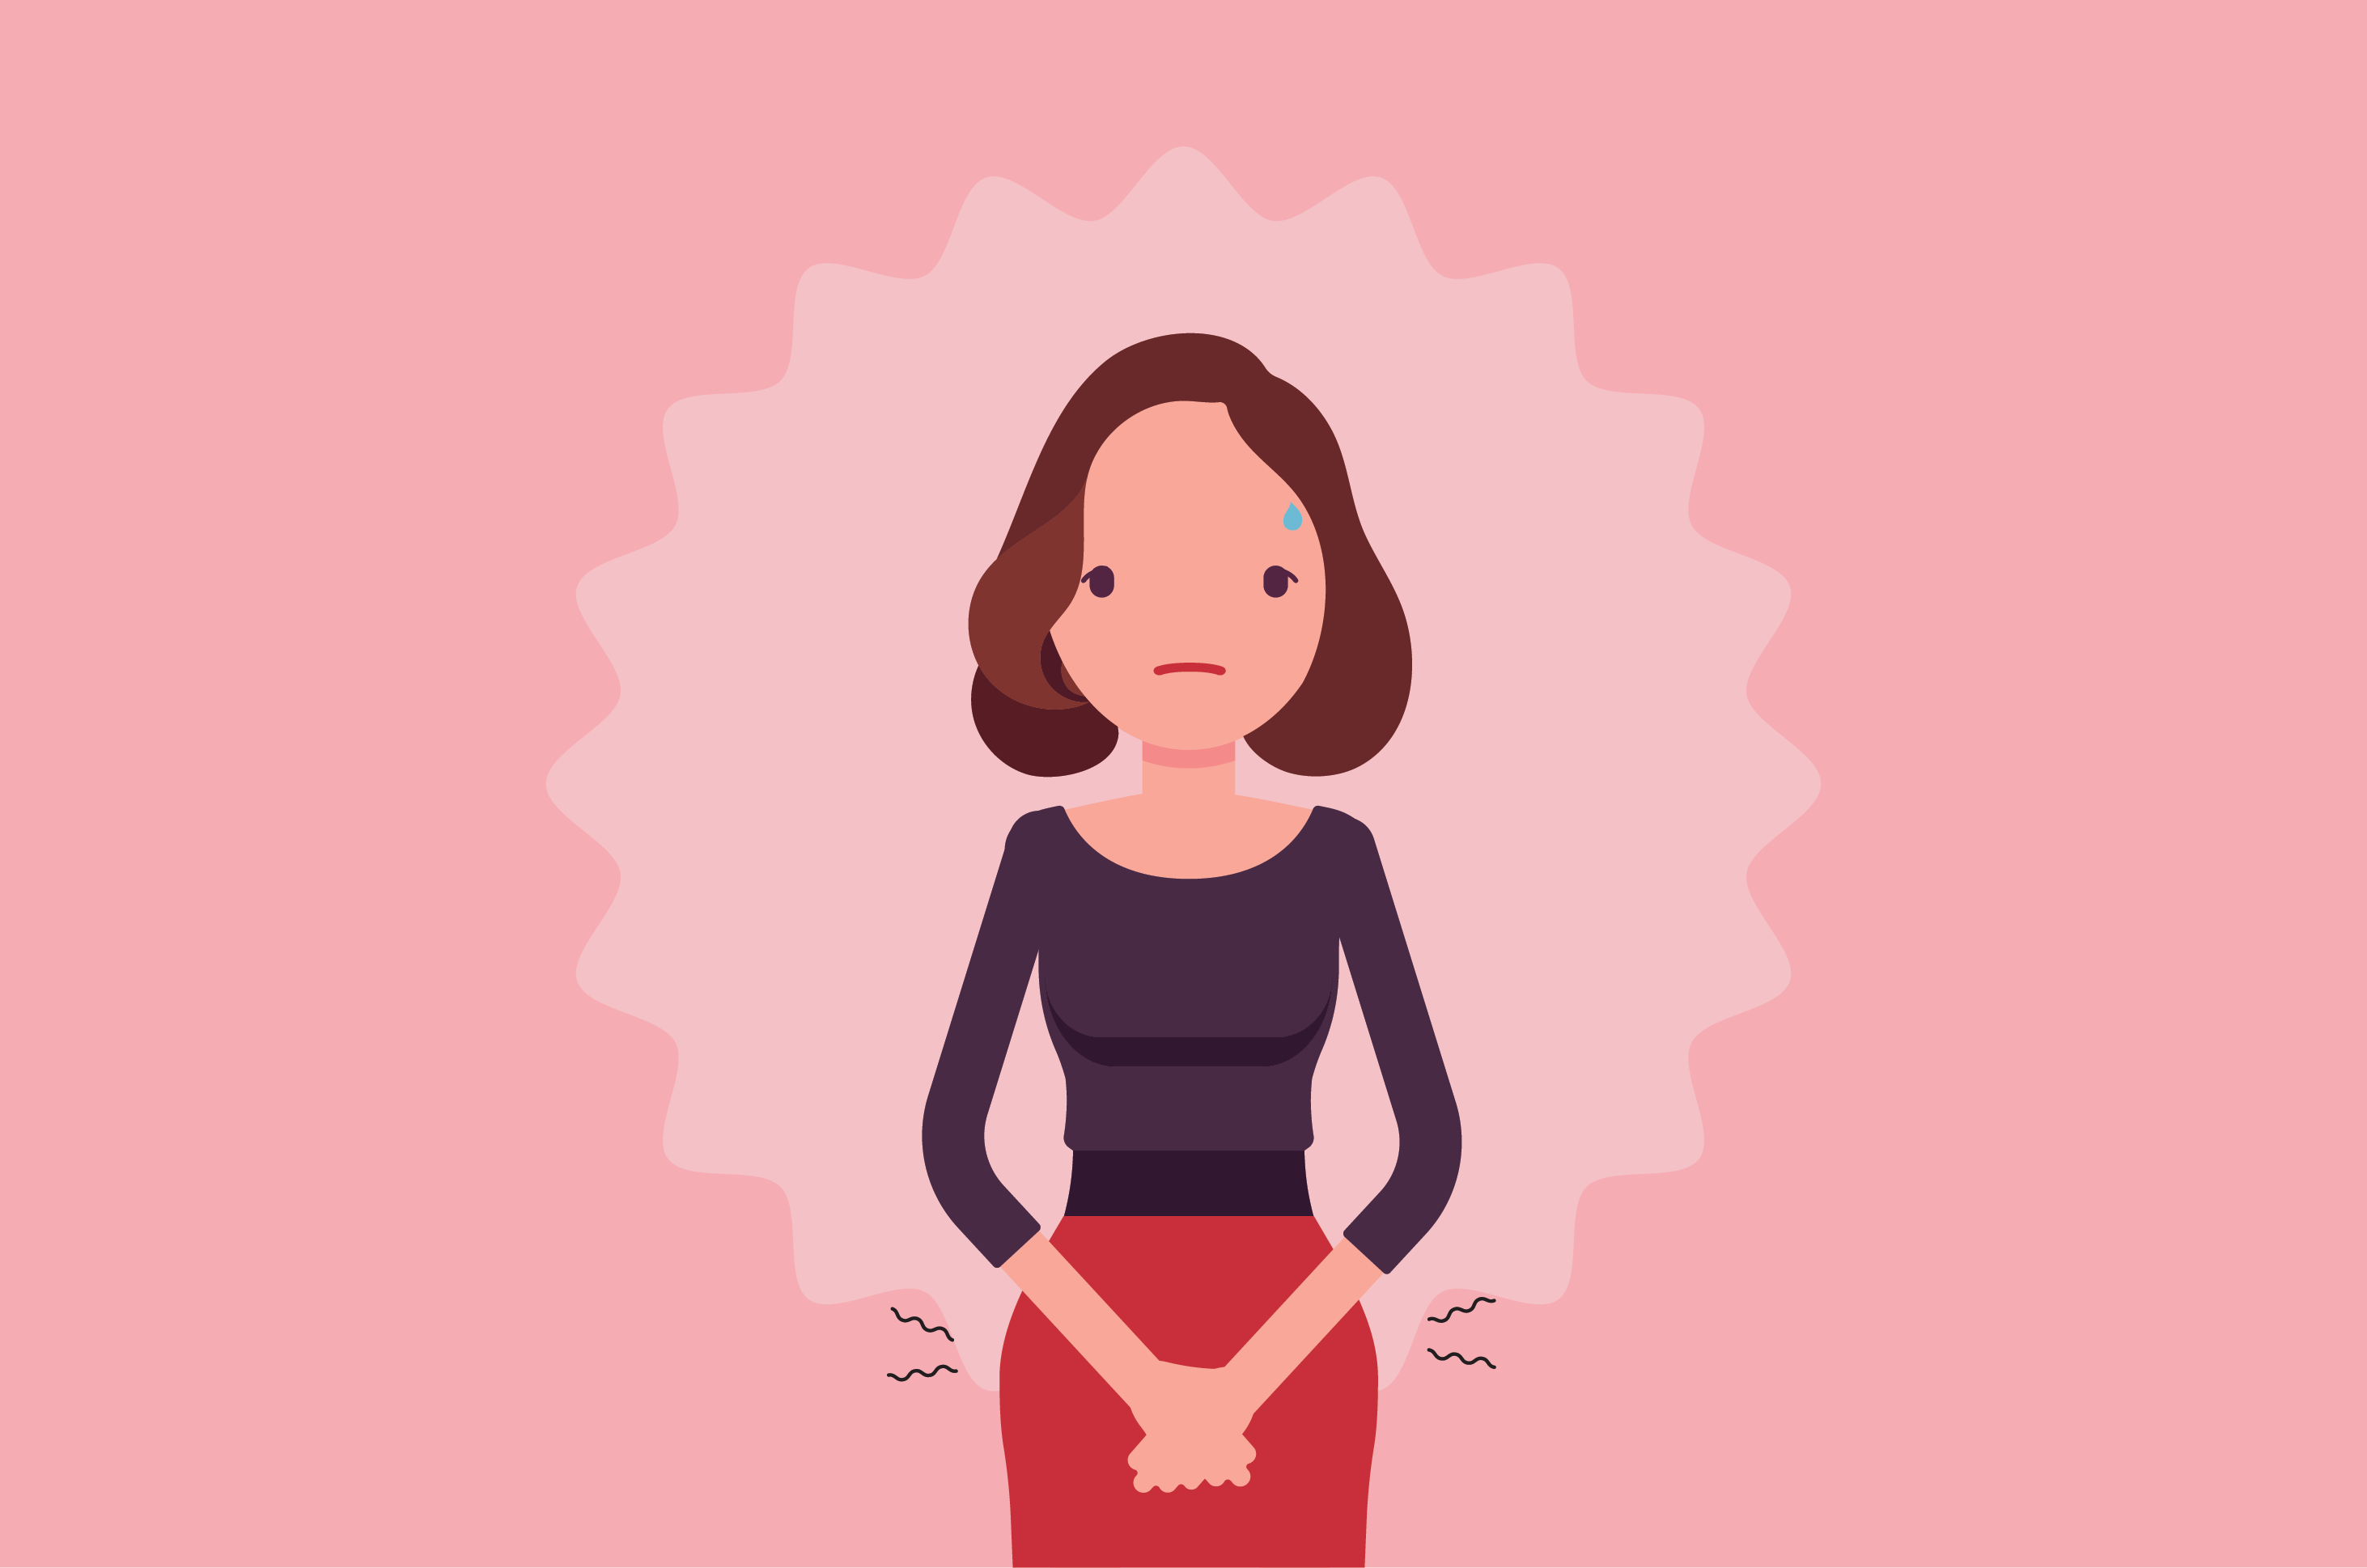 vaginitis karena perubahan hormon, gatal pada miss v